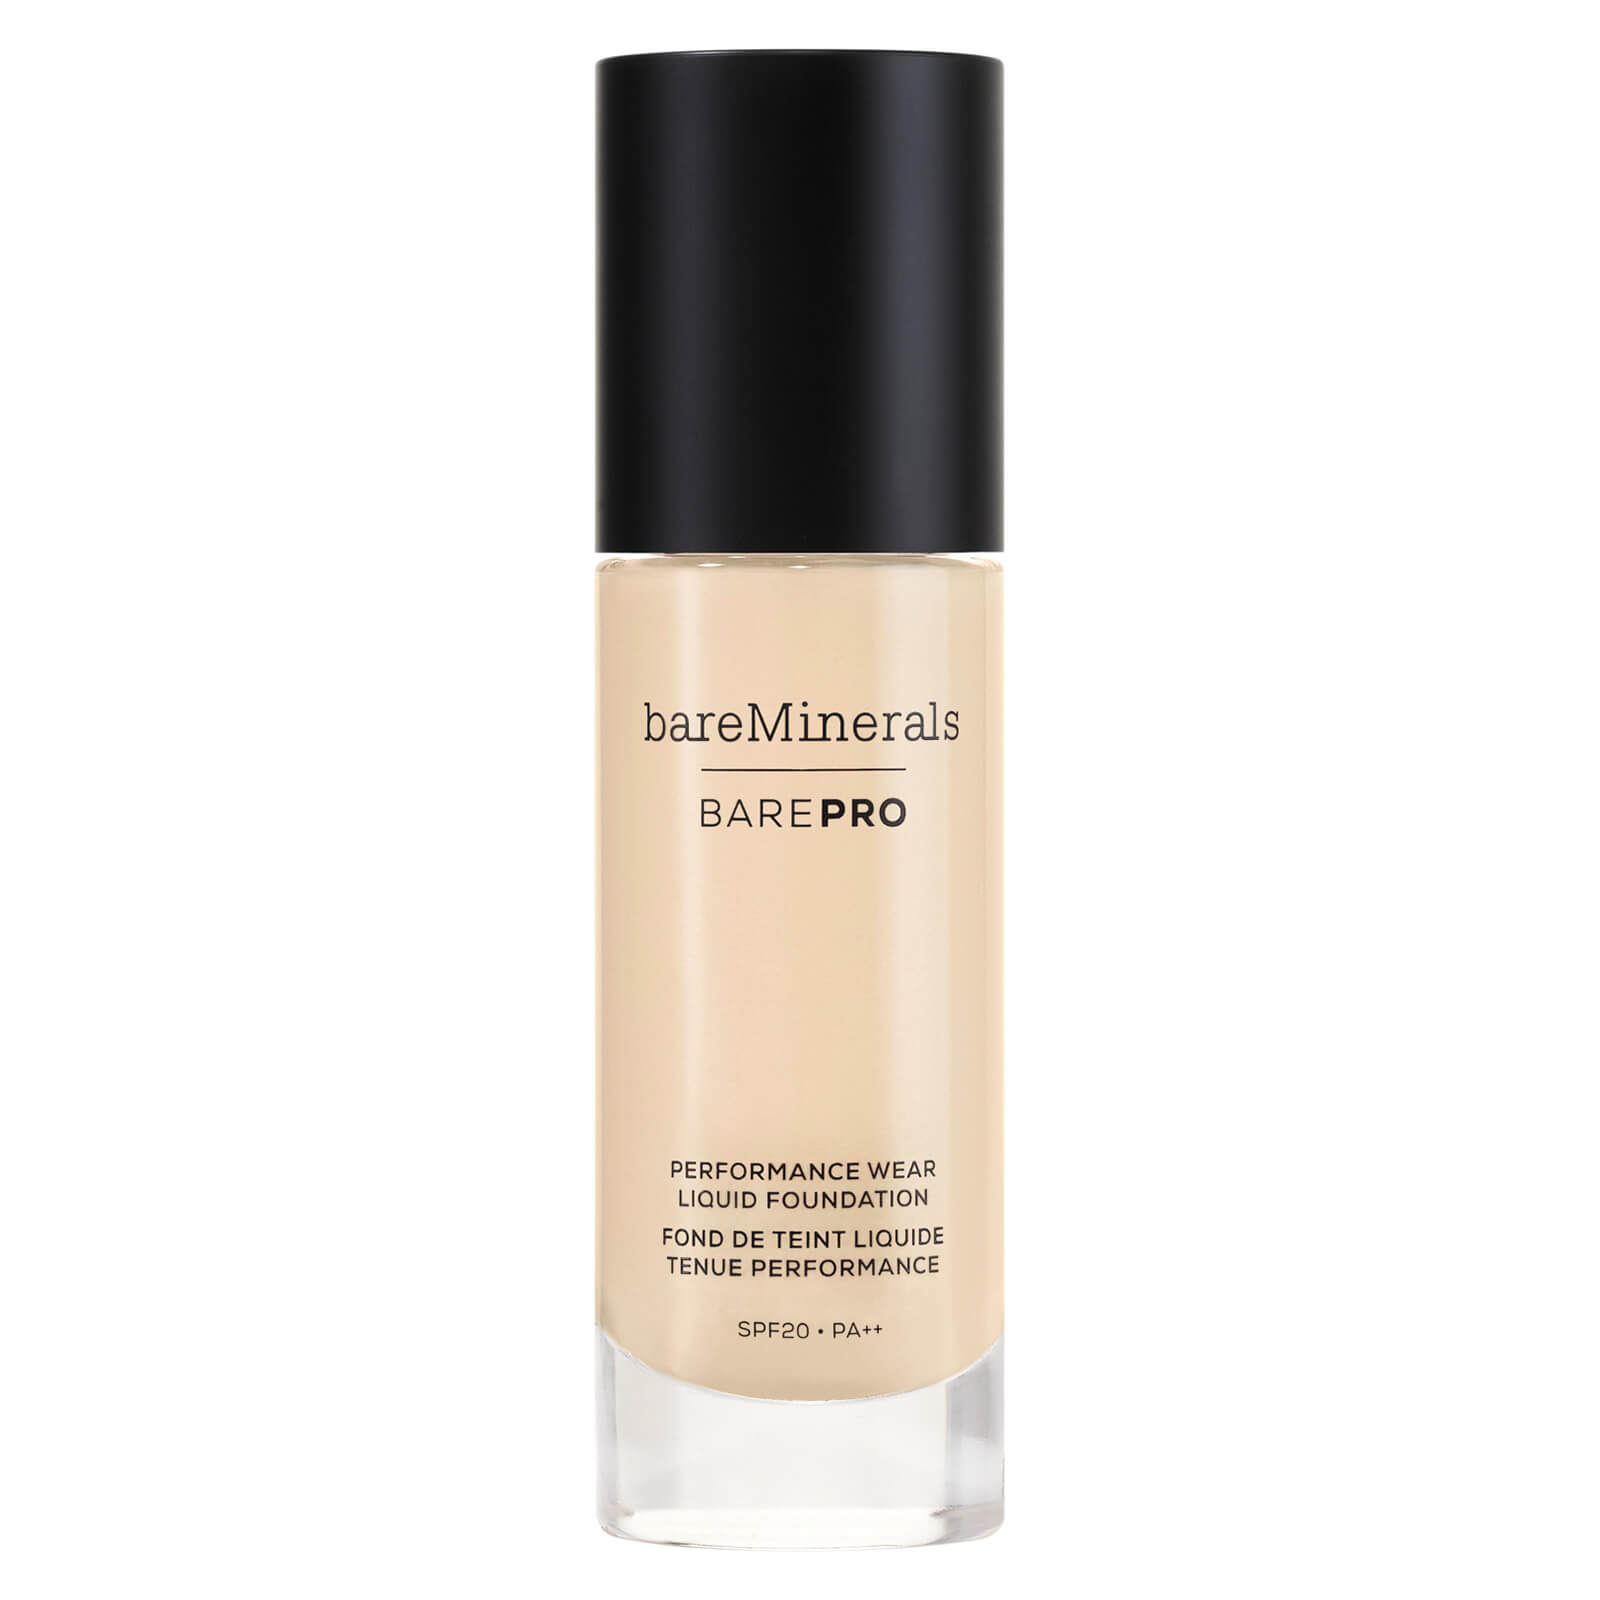 Base de maquillaje líquido BAREPRO de bareMinerals